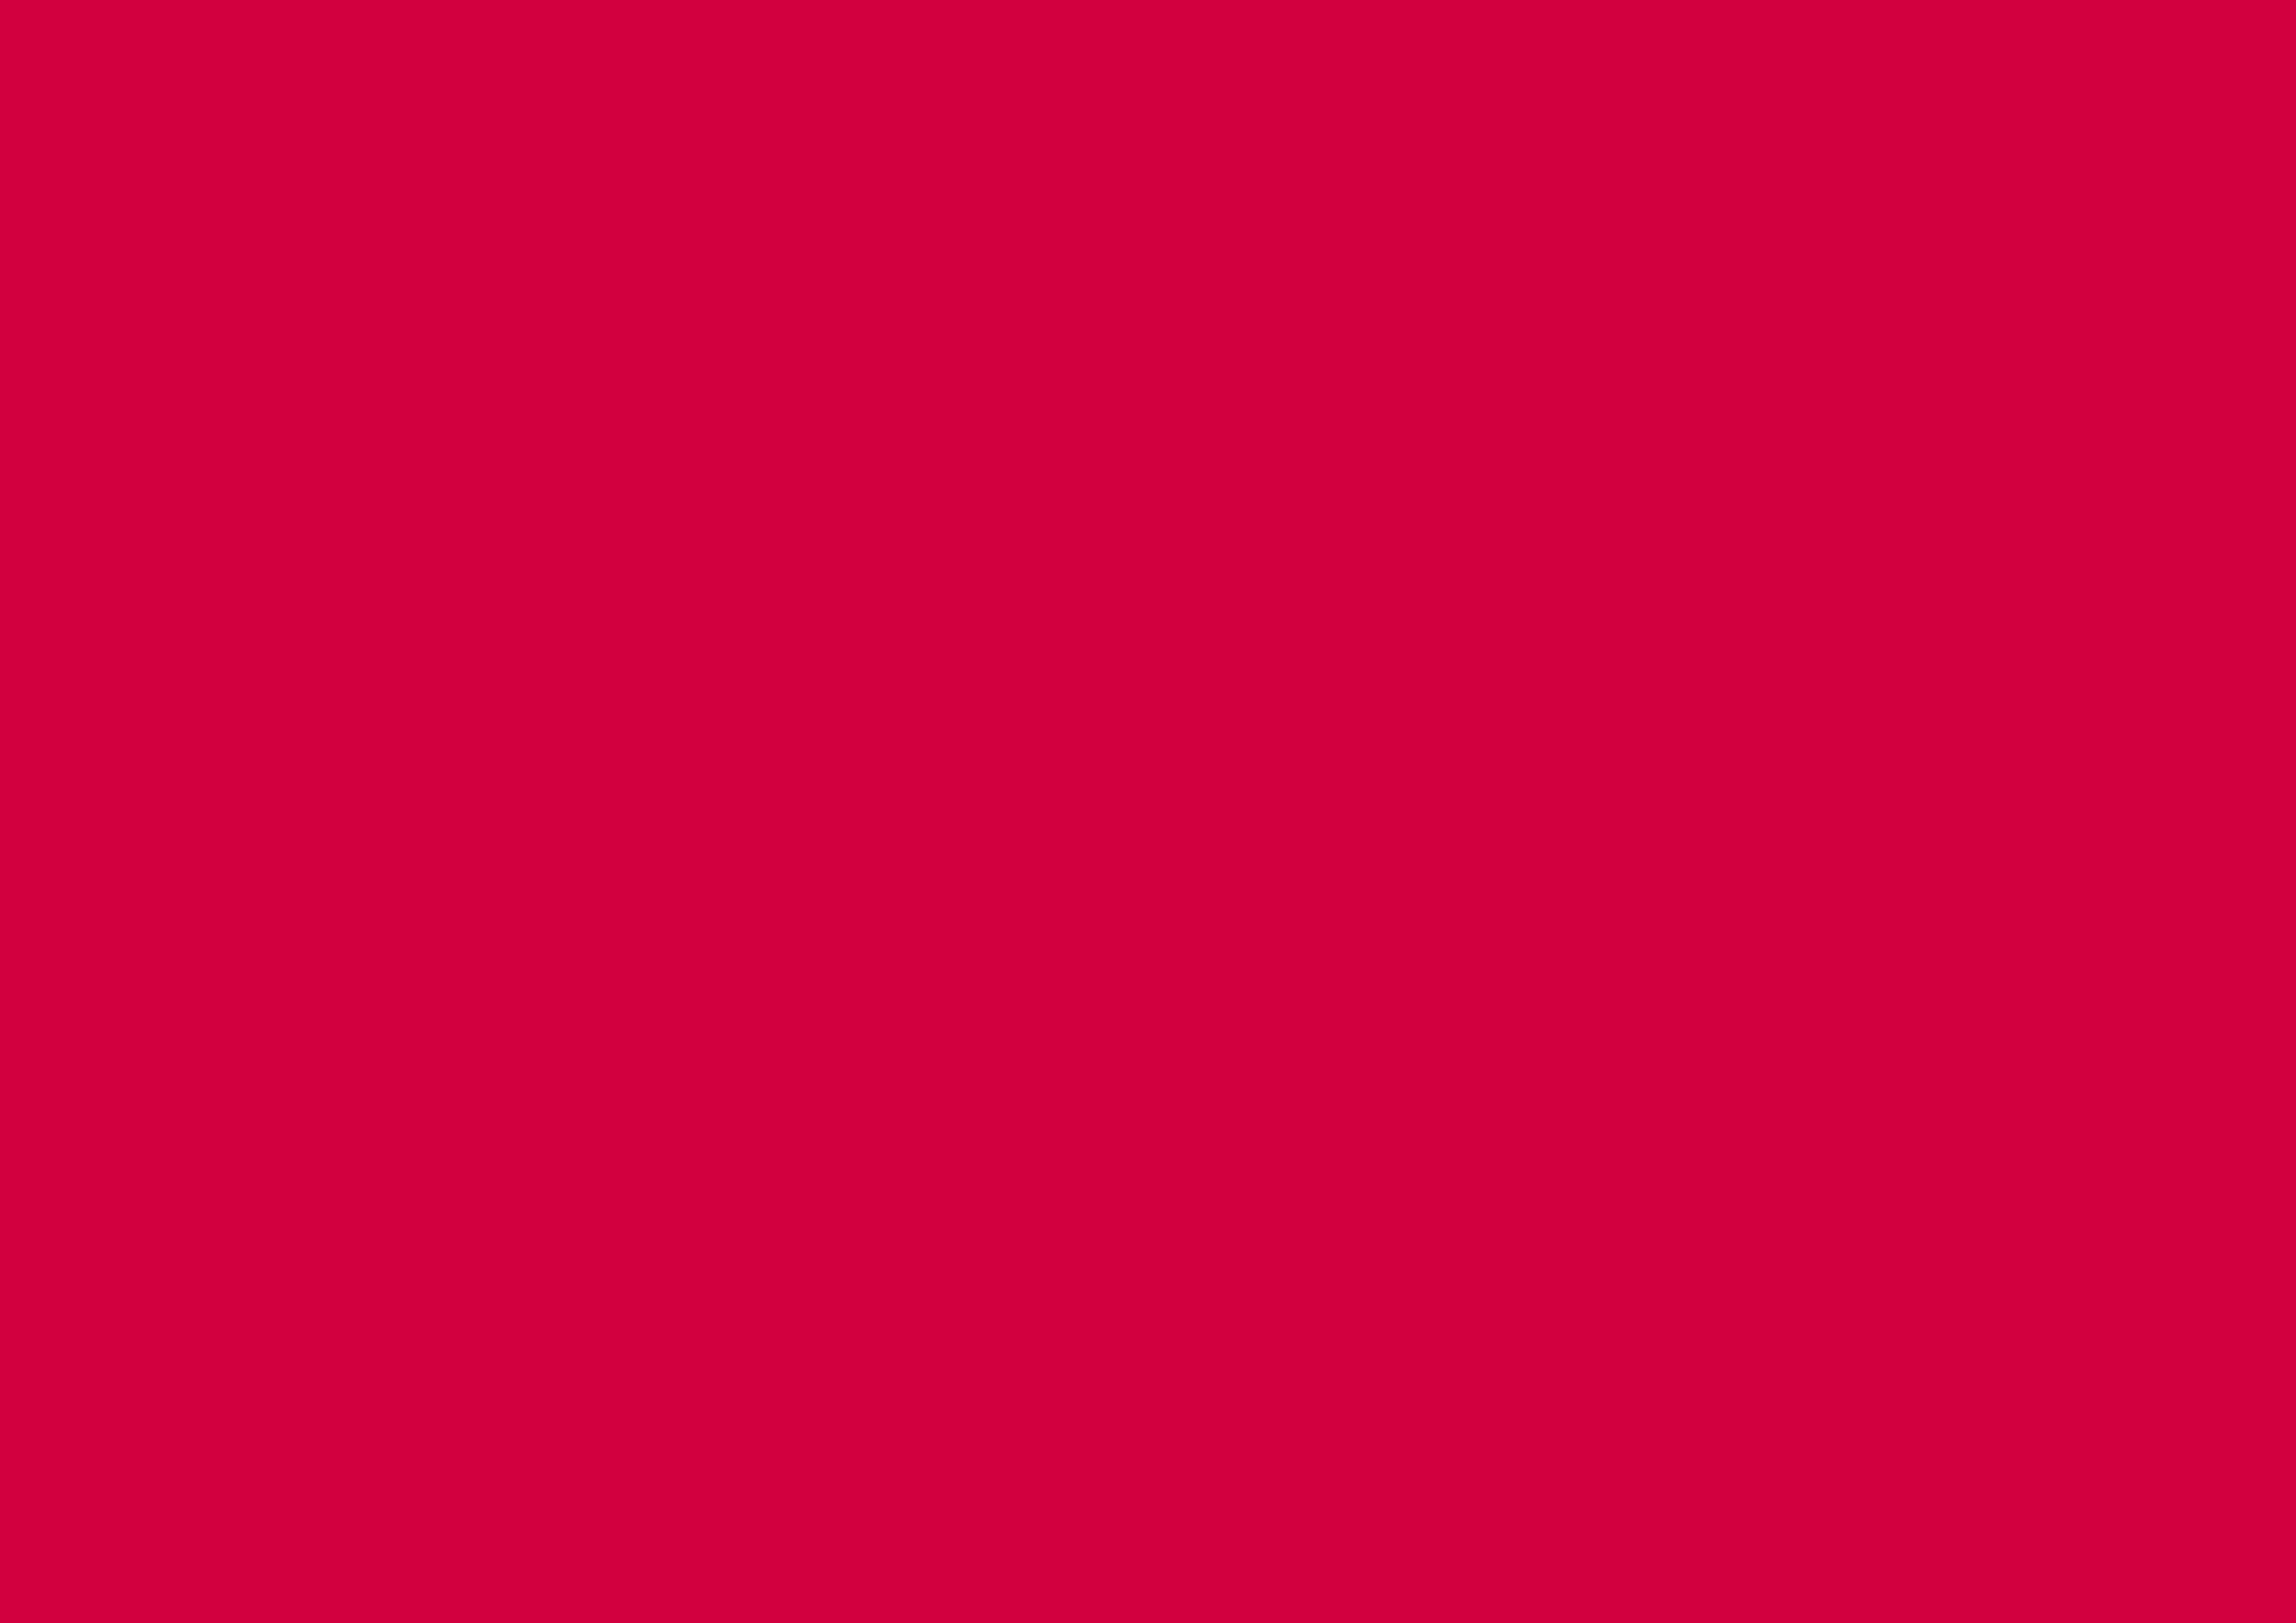 3508x2480 Utah Crimson Solid Color Background